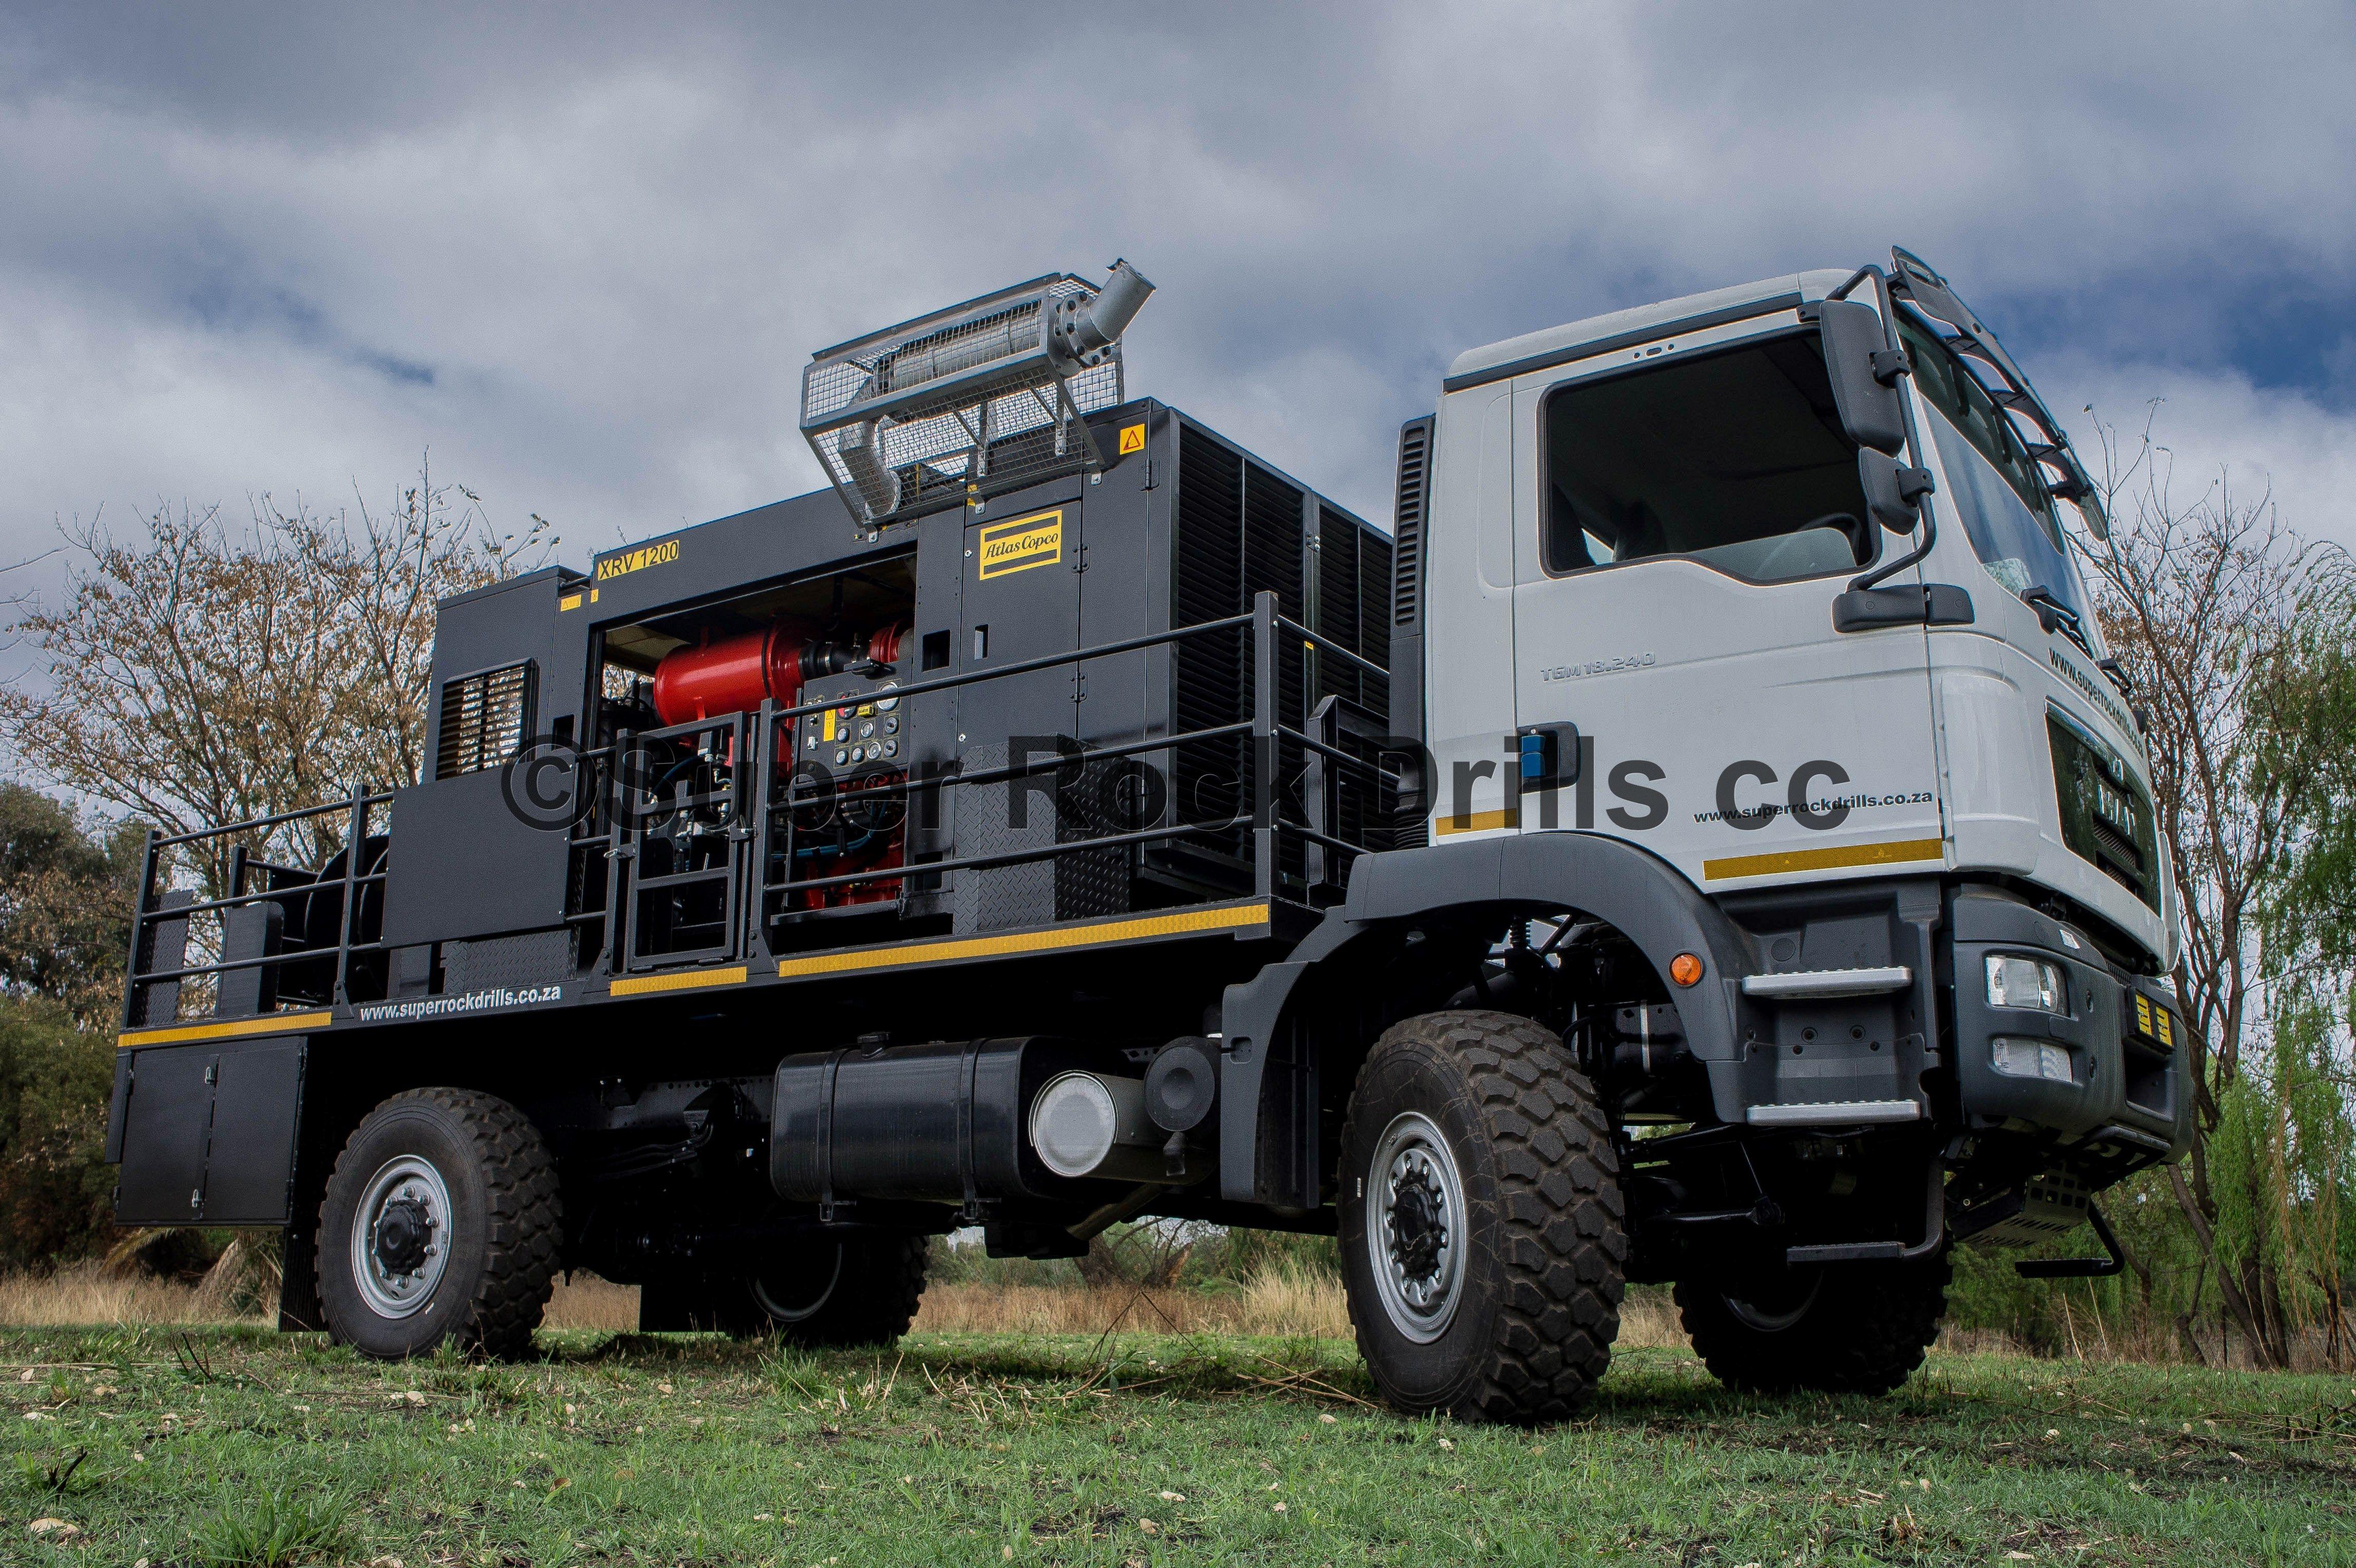 Atlas Copco Compressor Mounted Onto A New Man Truck Drilling Rig Drilling Machine Drill